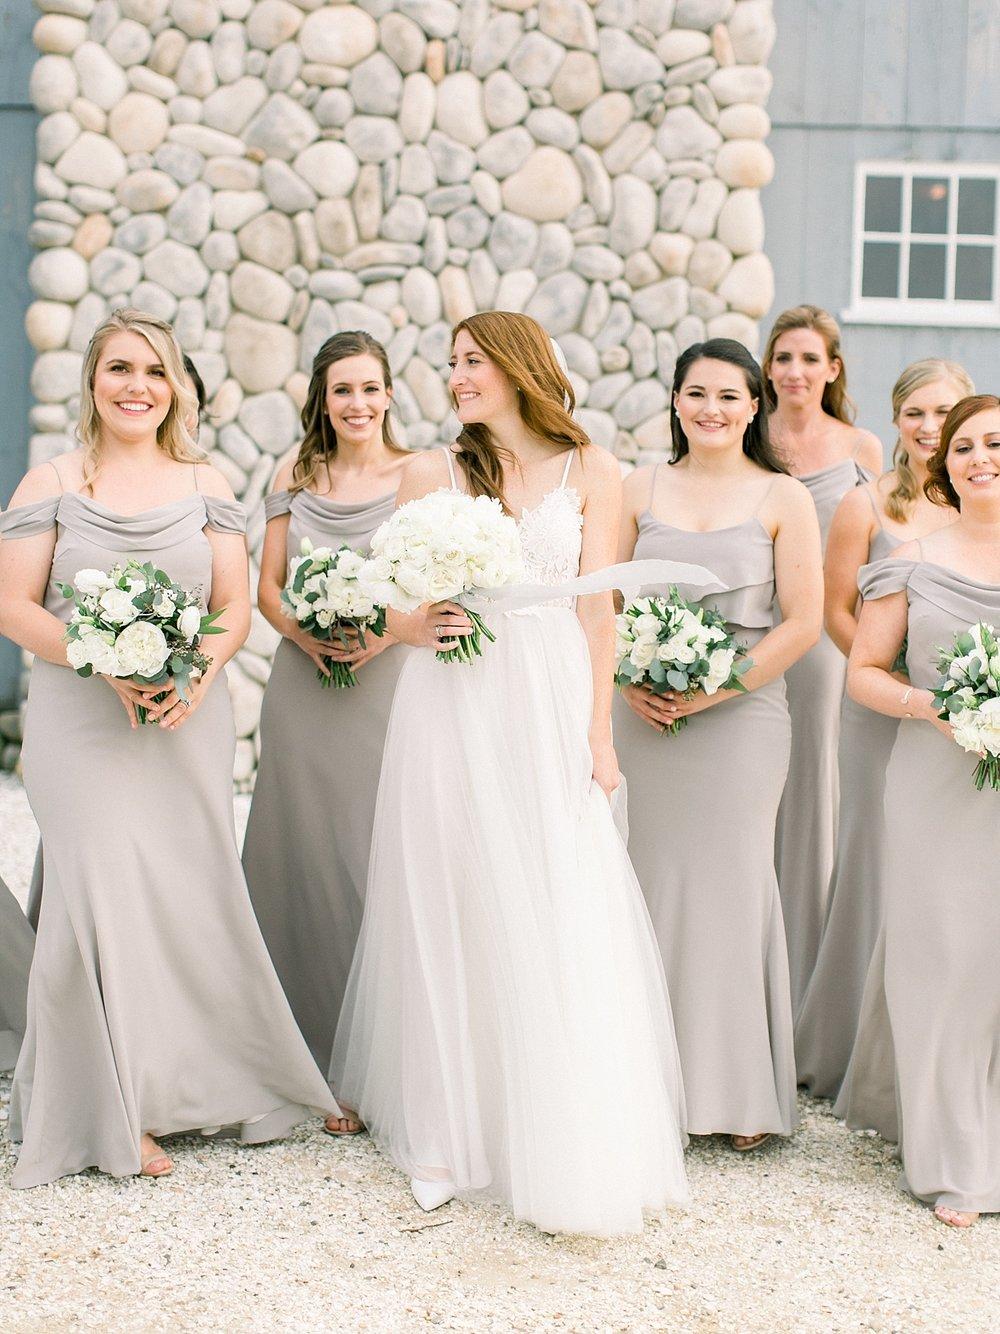 bonnet_island_estate_lbi_nj_wedding_photos_0028.jpg